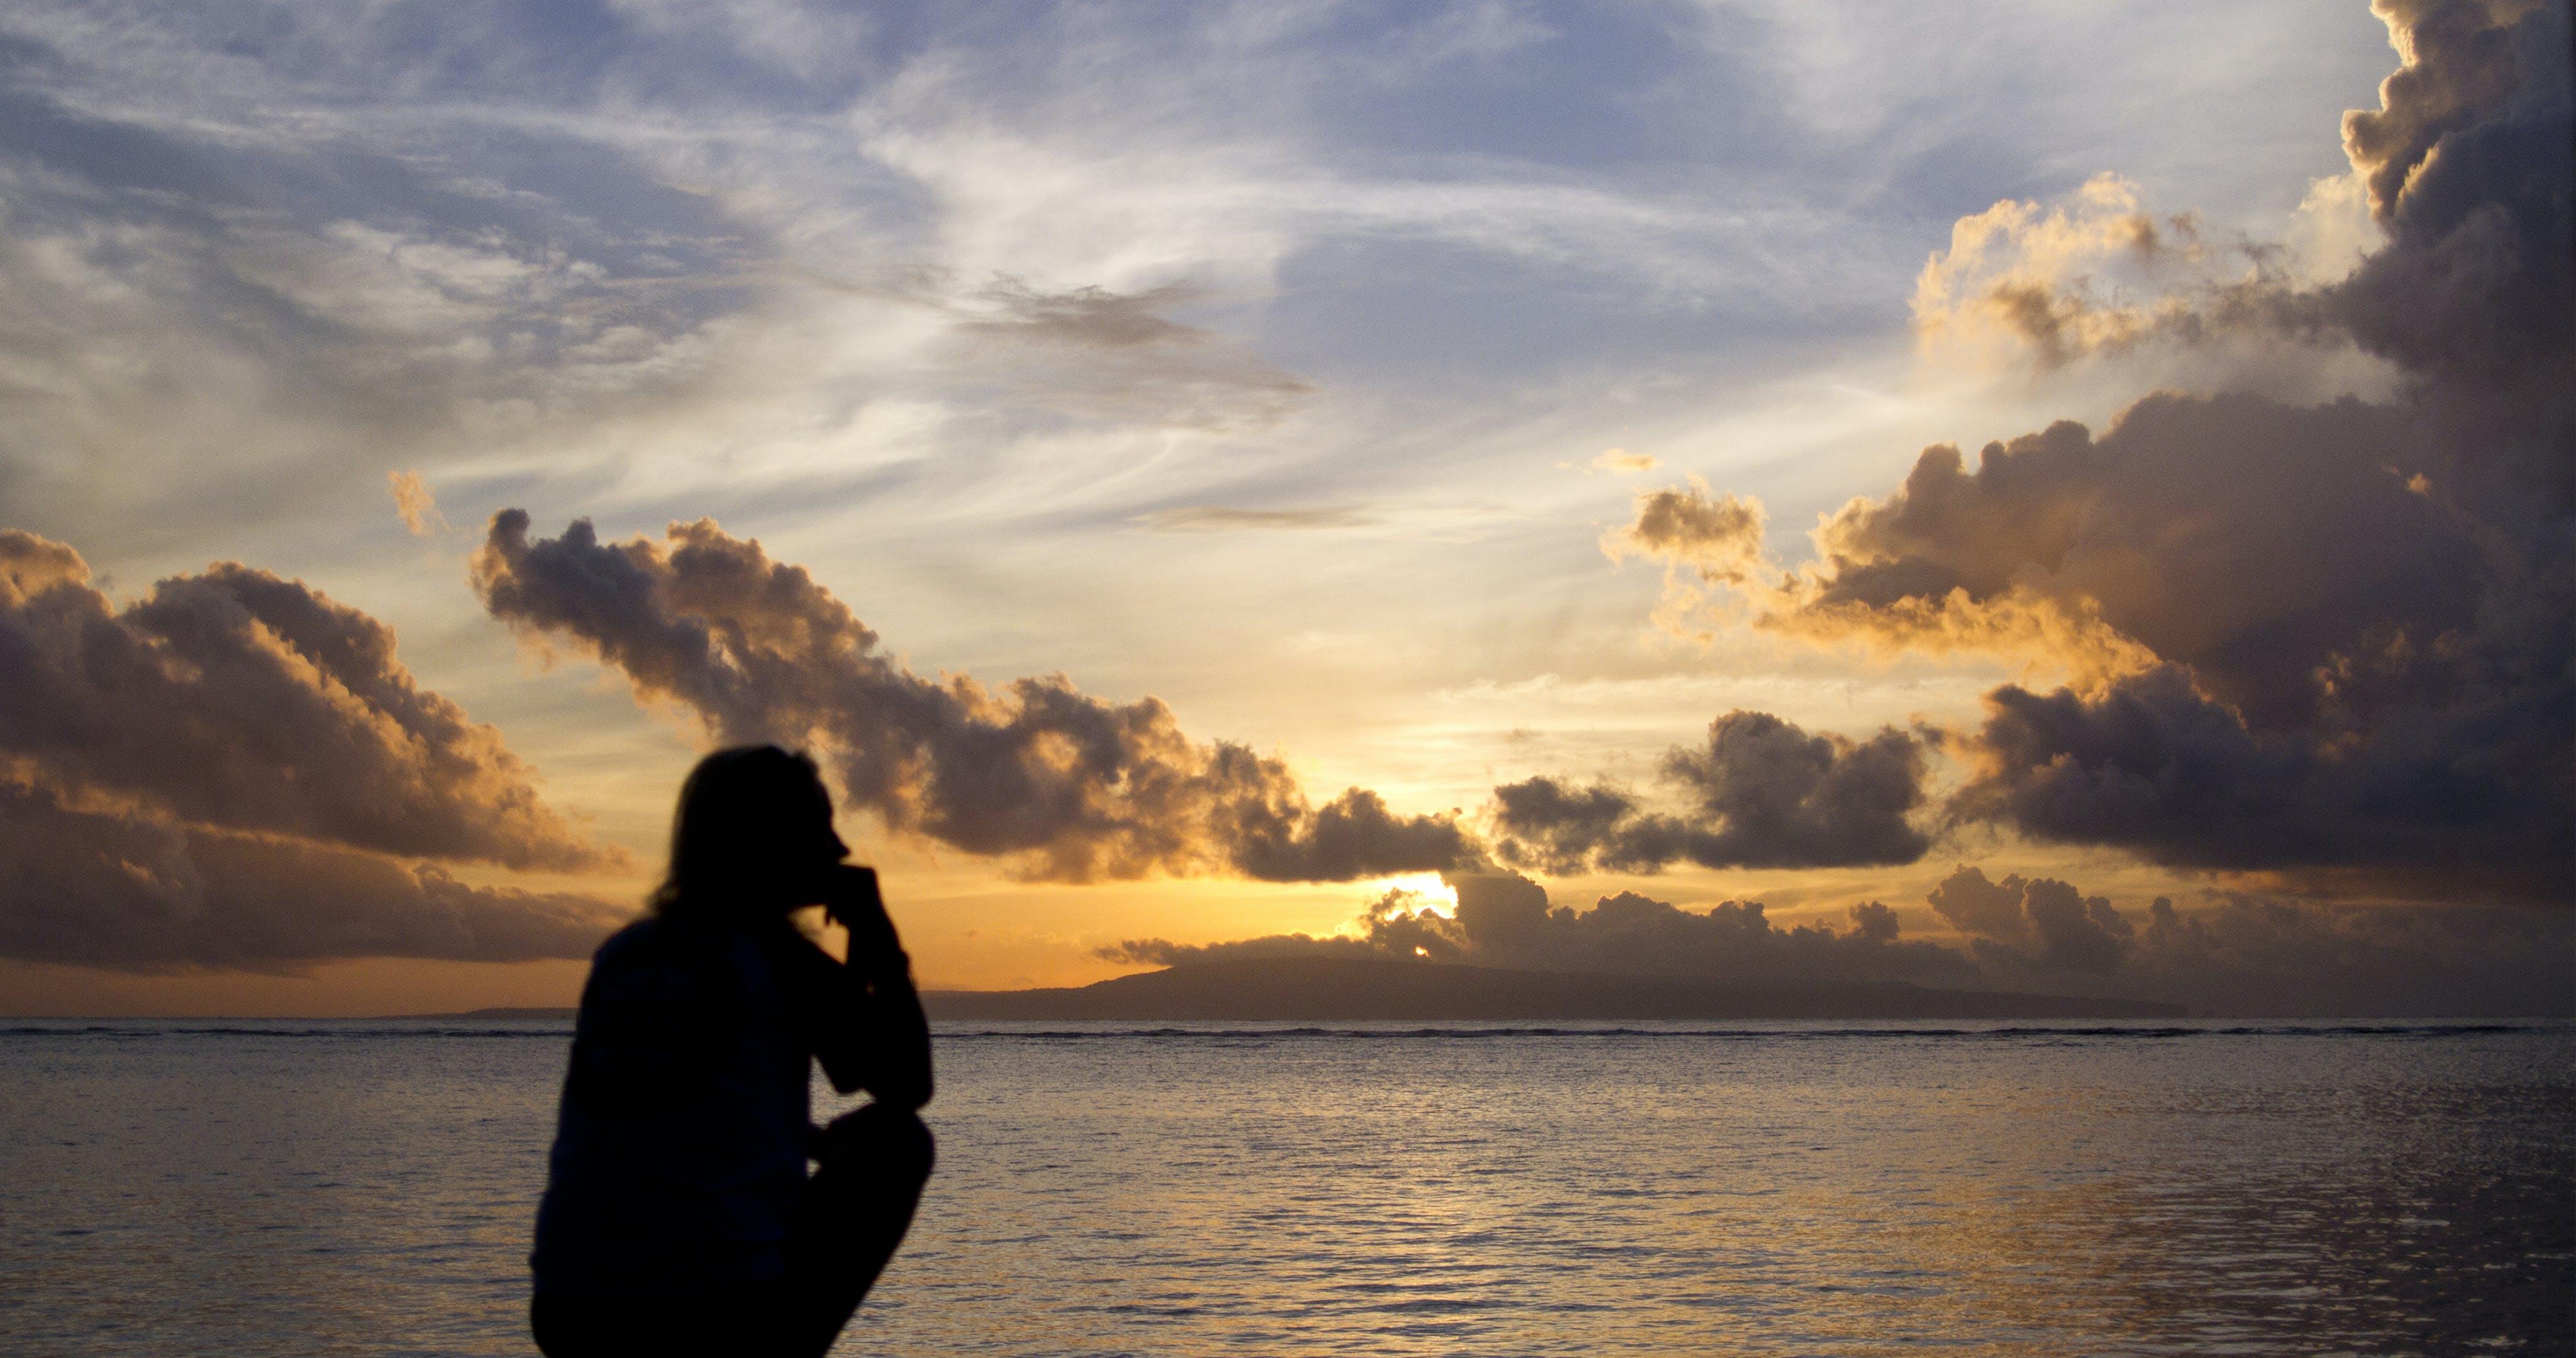 Free stock photo of beach, girl, silhouette, sunrise